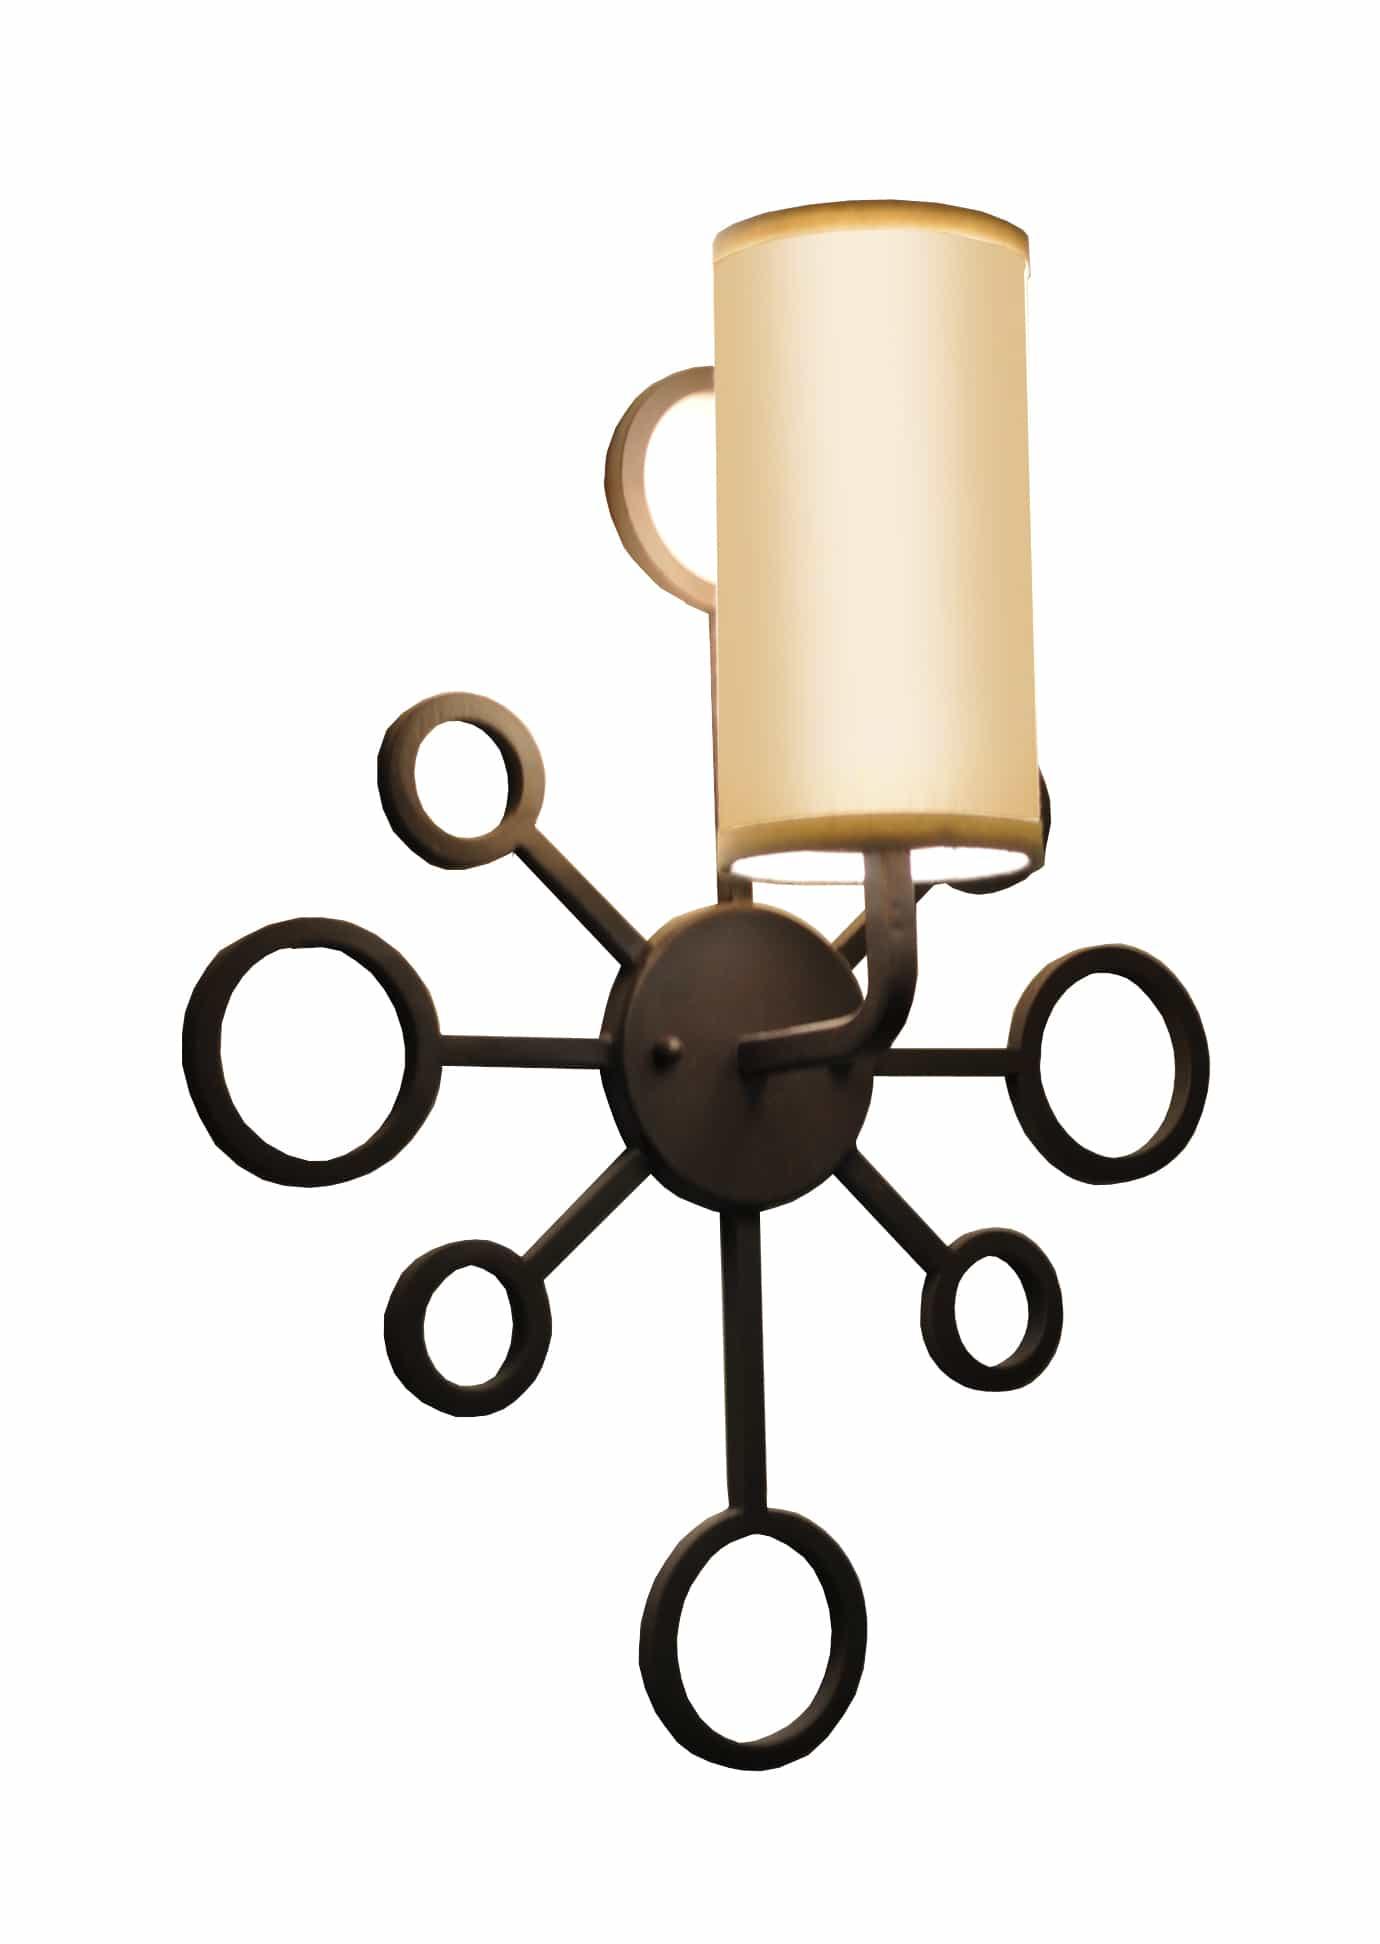 7795 Spago Wall Sconce Mid Century Modern Royer – ADG Lighting